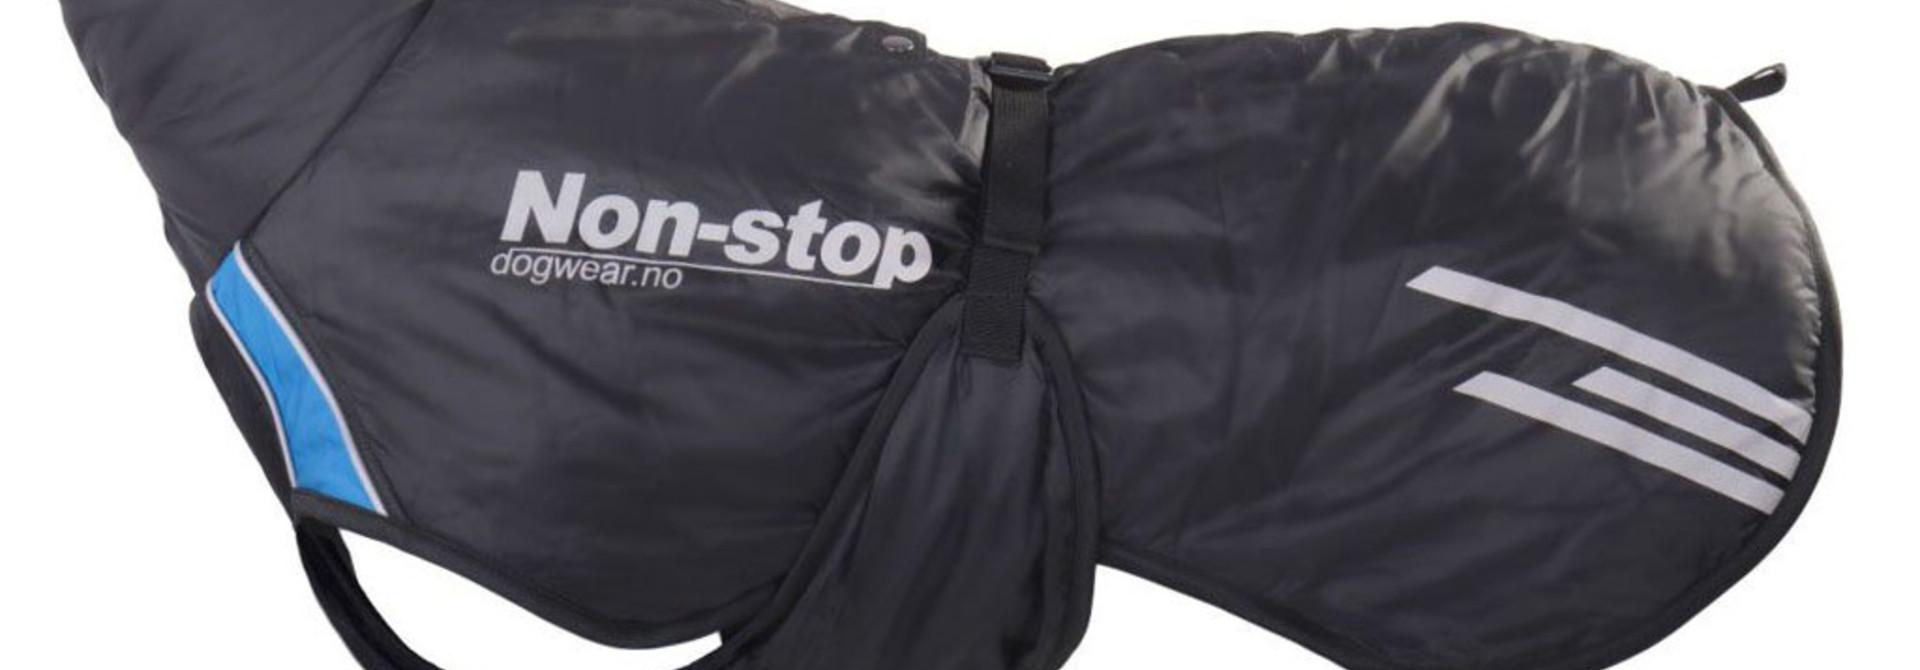 Non-stop Pro Warm Jacket